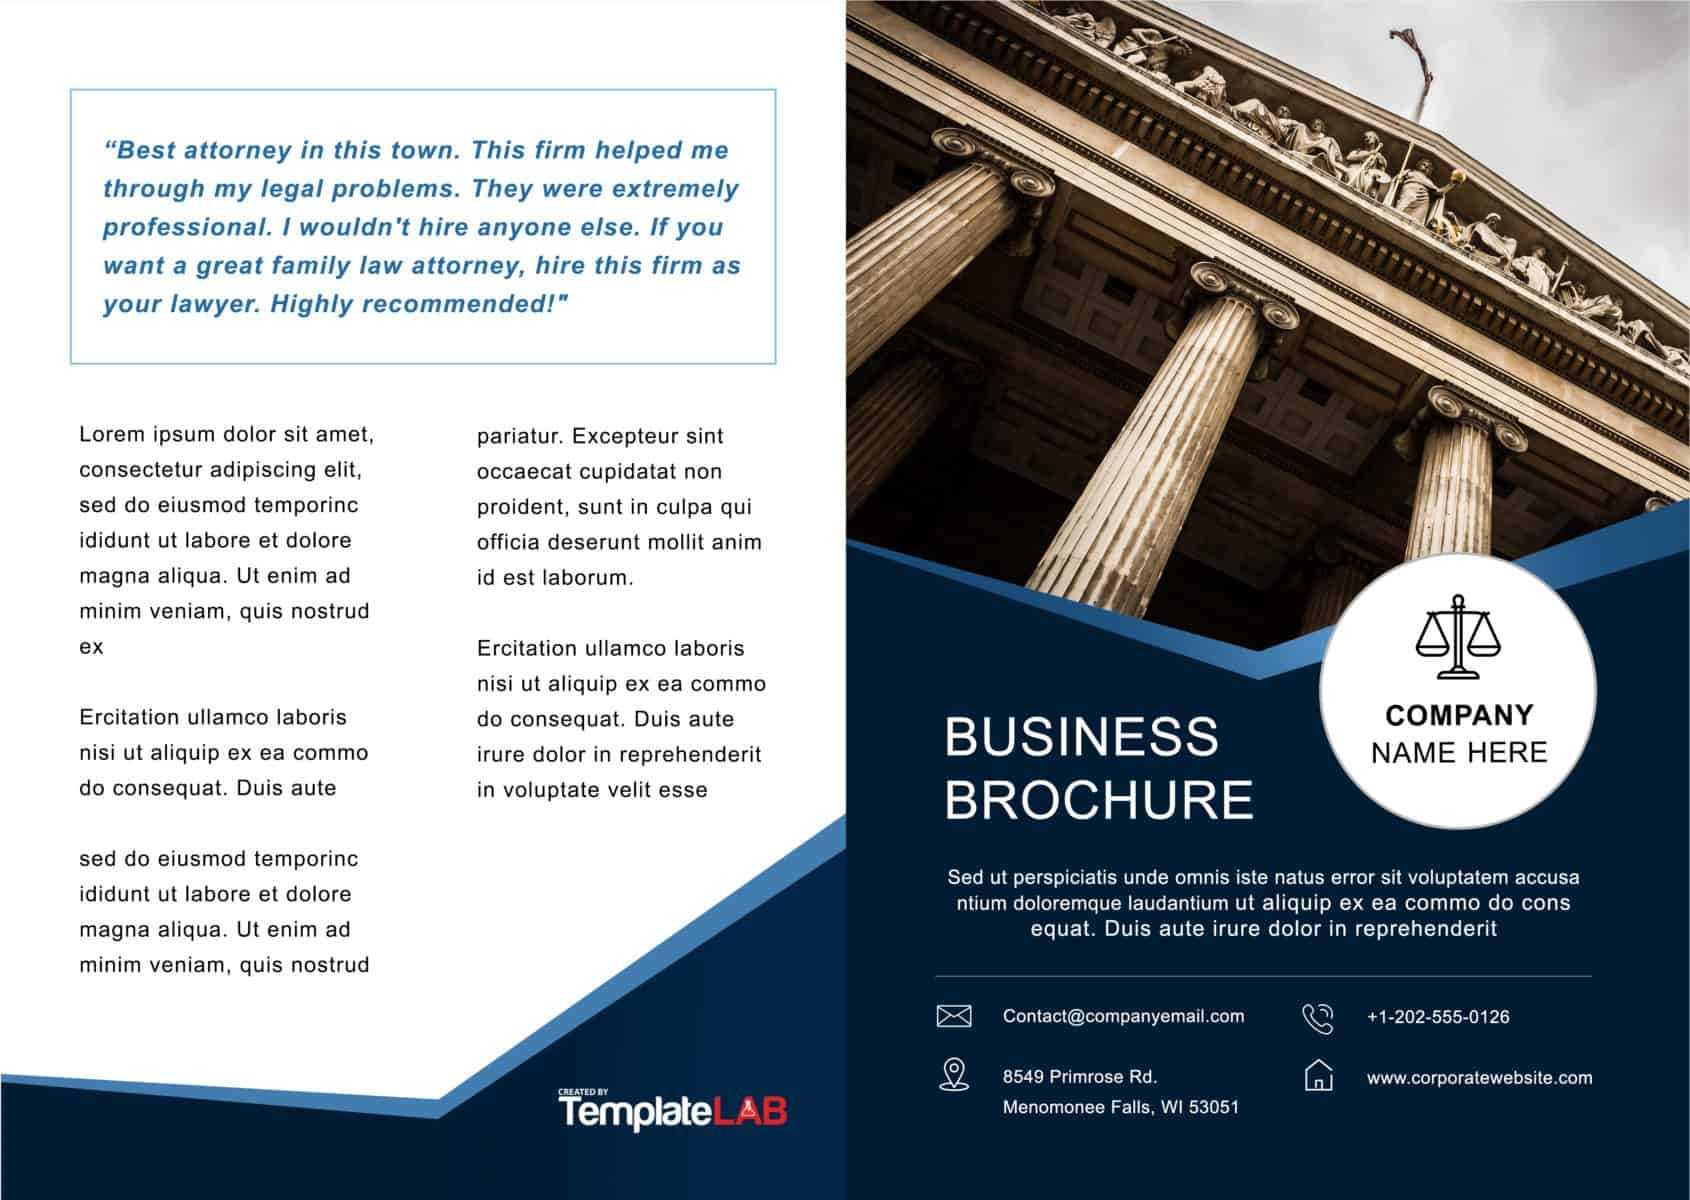 33 Free Brochure Templates (Word + Pdf) ᐅ Templatelab For Microsoft Word Brochure Template Free